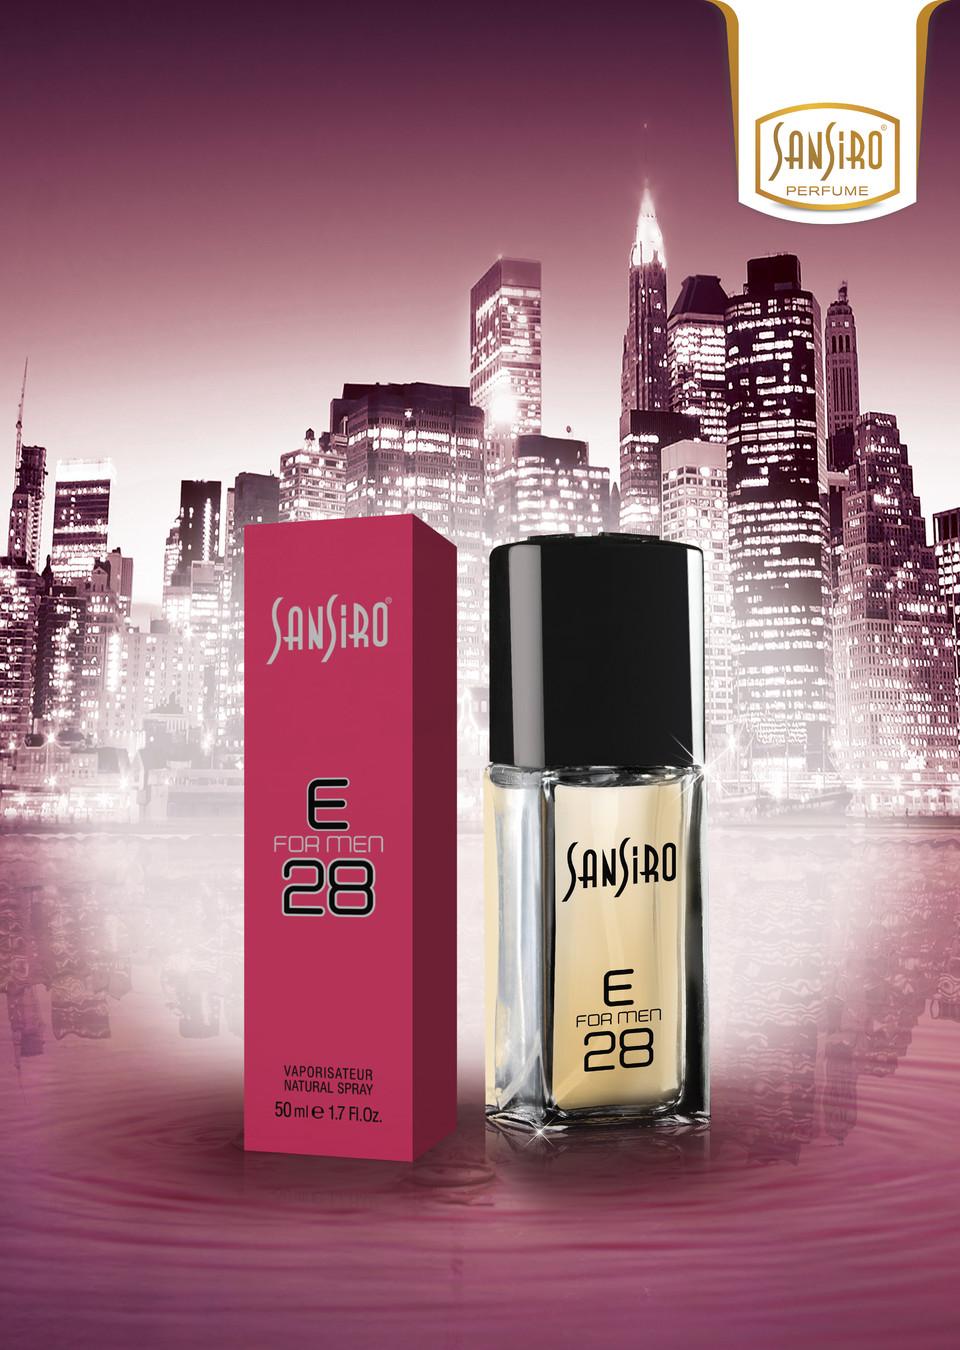 Sansiro Perfume - For Men - Romios (E28)